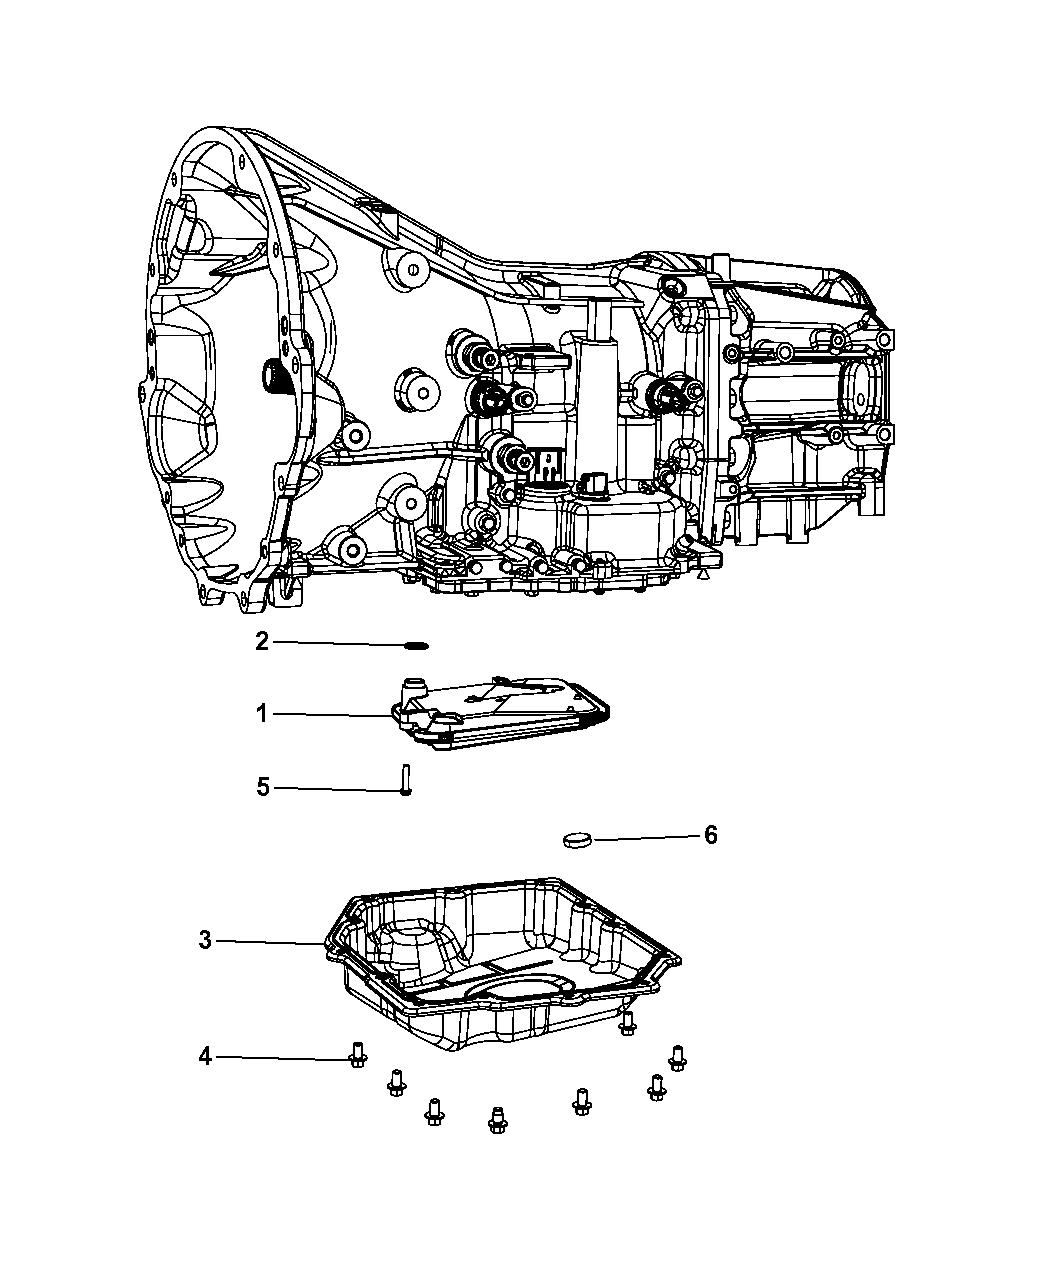 2010 jeep wrangler transmission oil filters - thumbnail 1